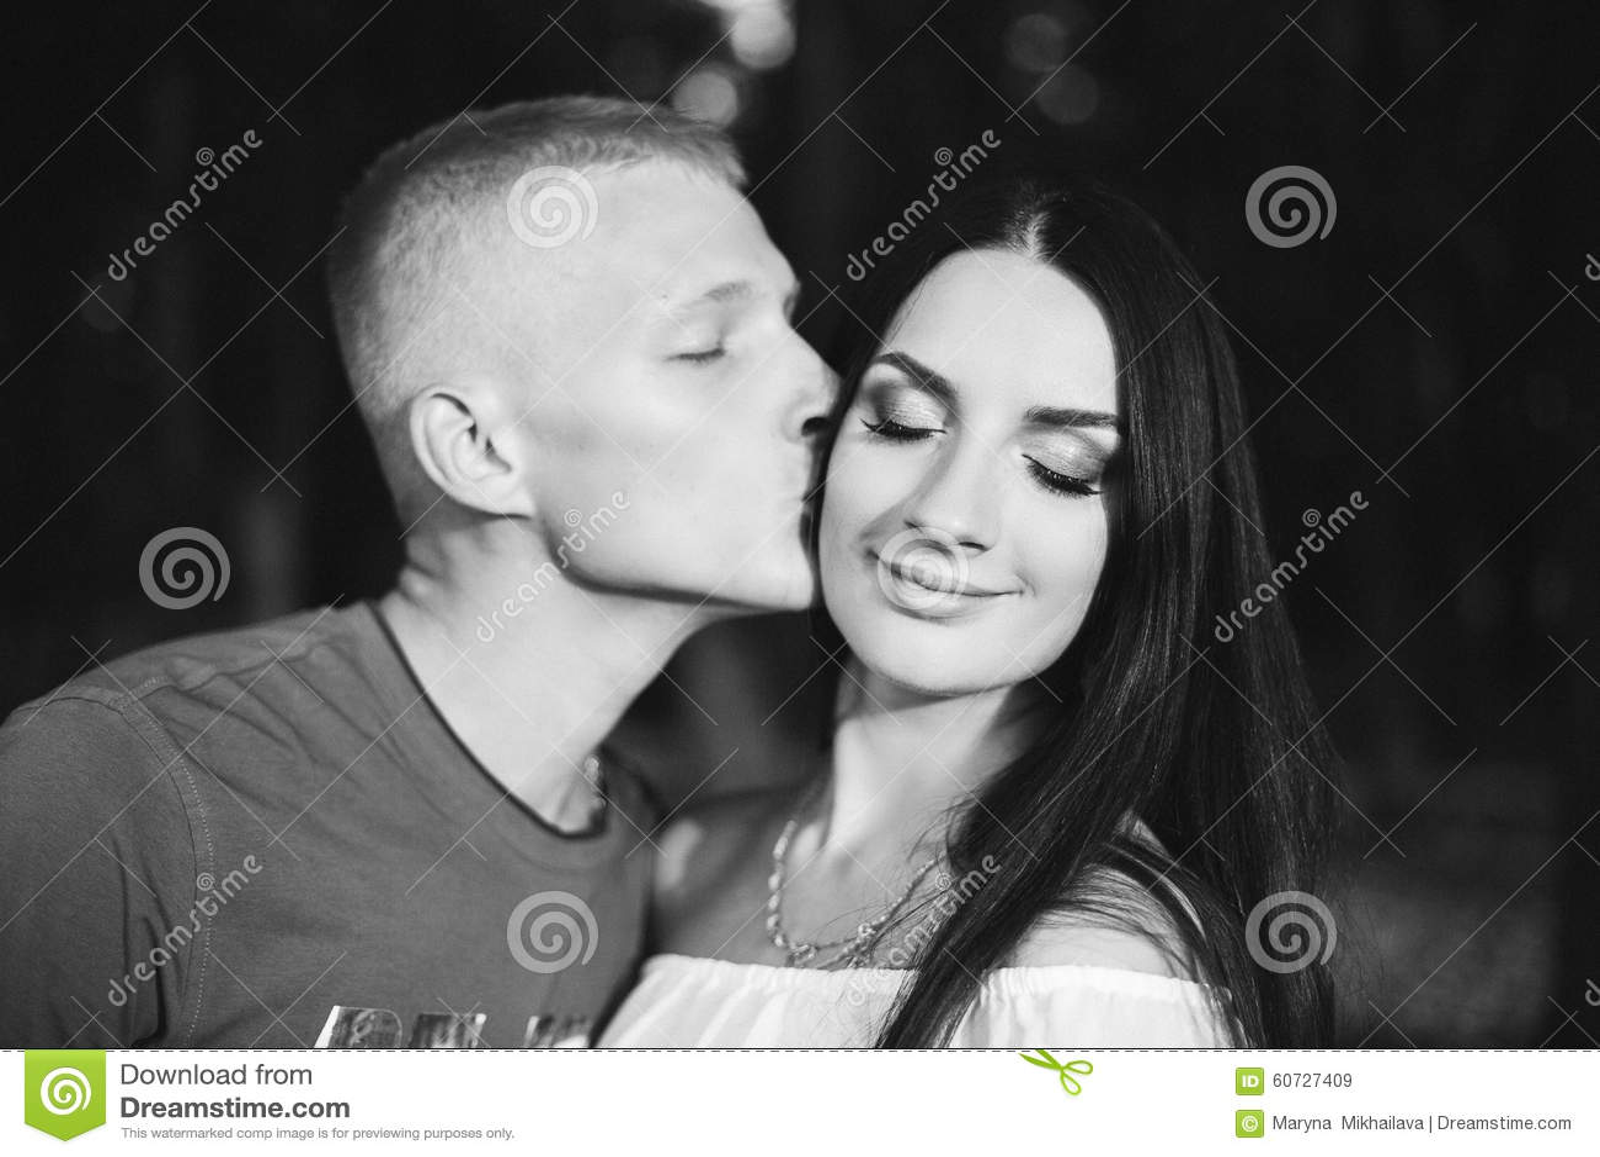 zachte dating gratis dating site Thailand